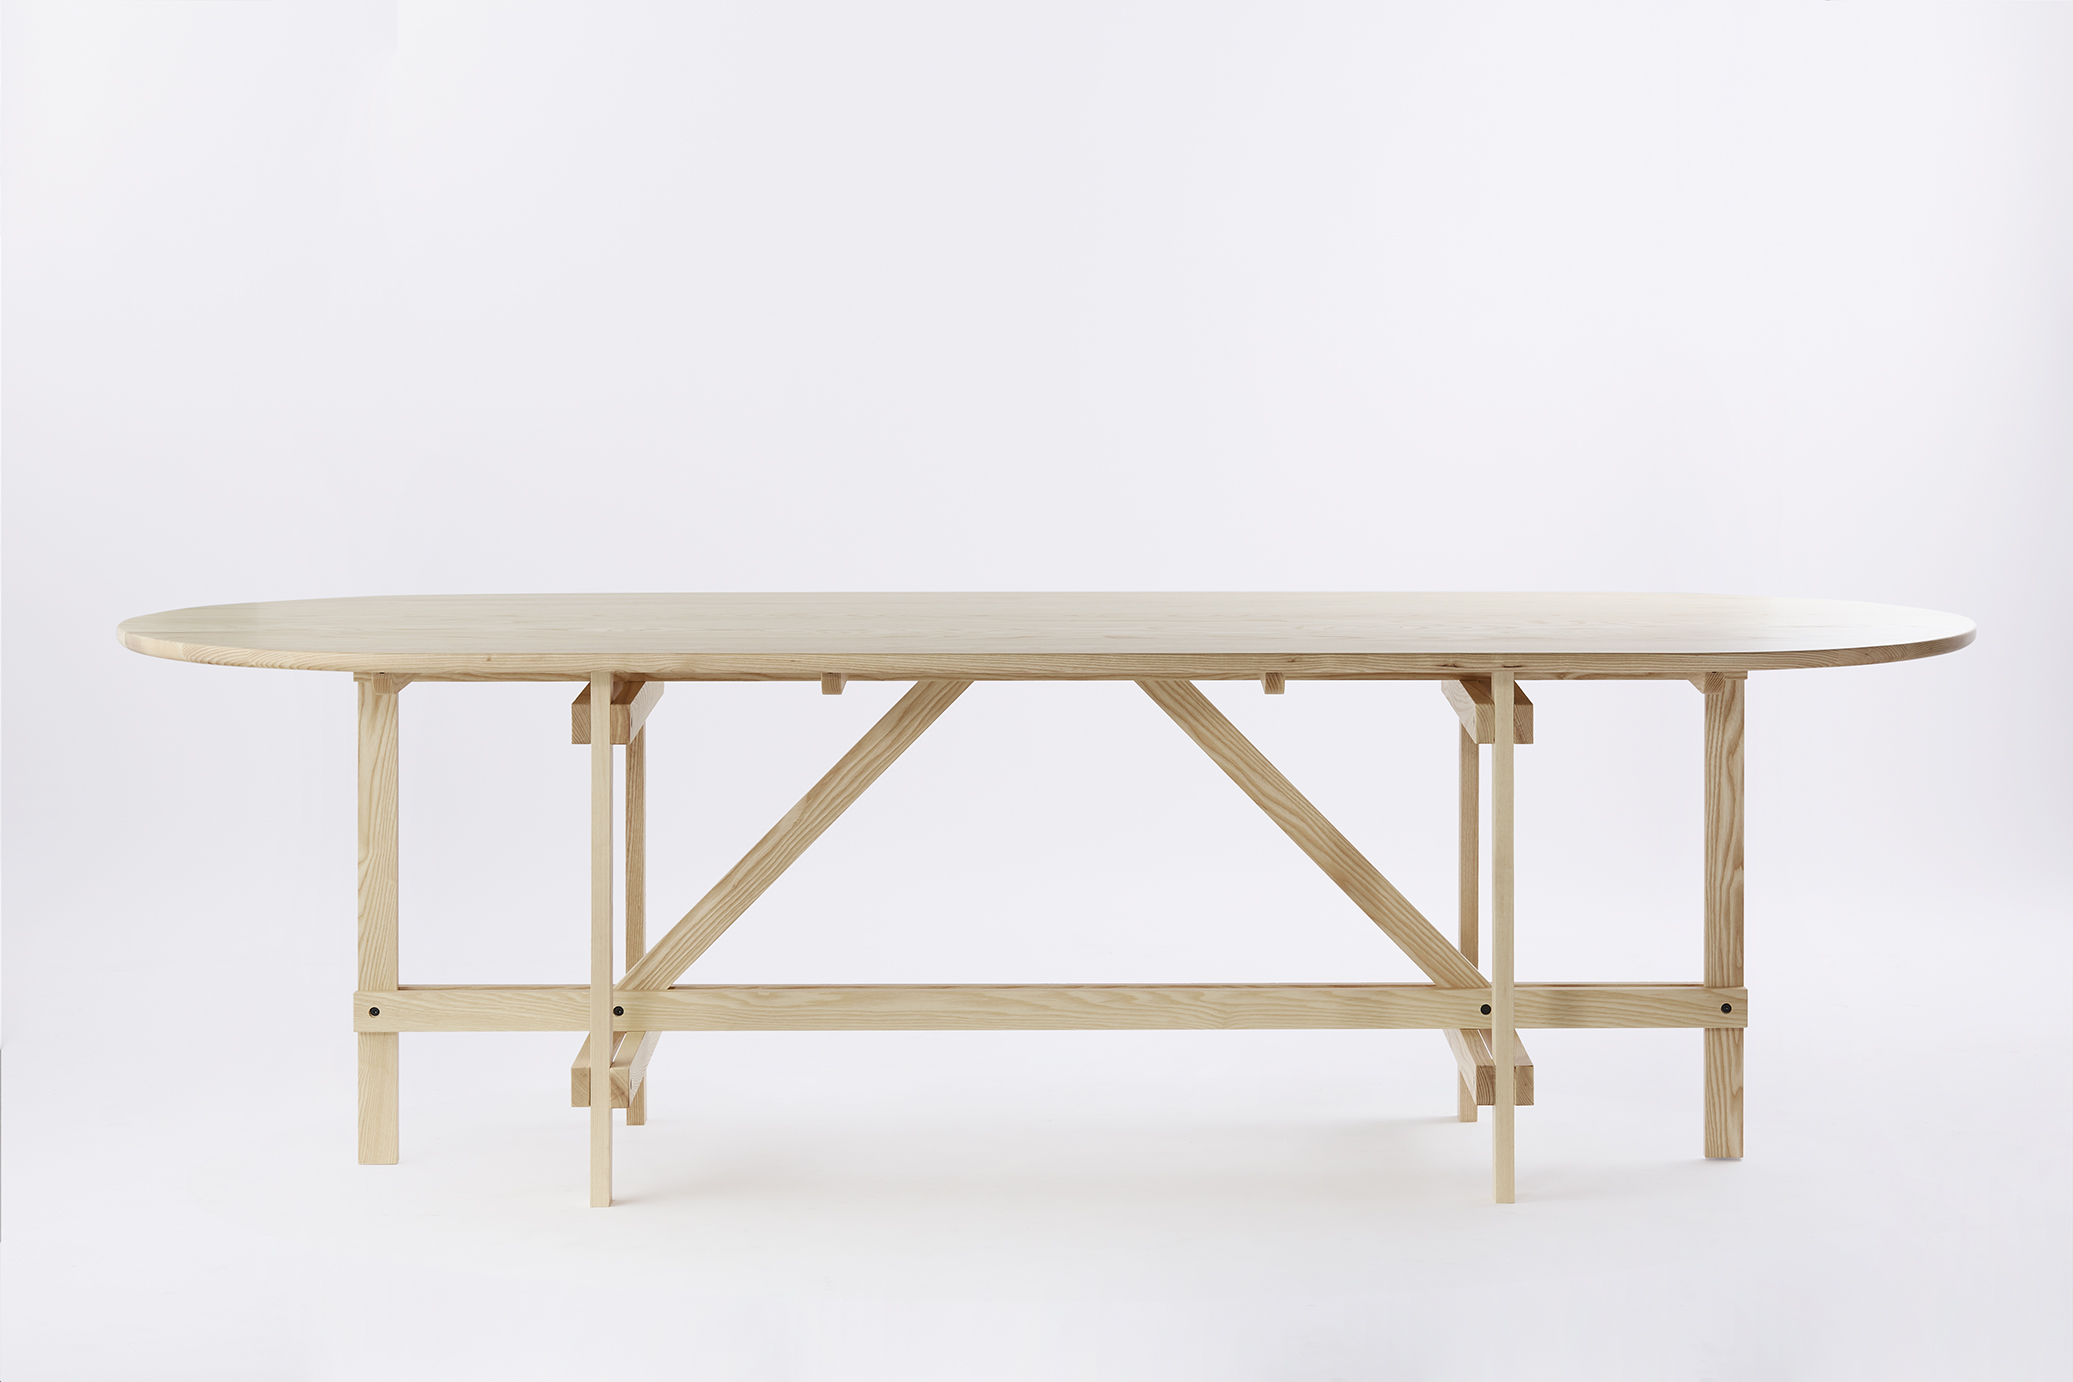 Arch Table - Braced Frame